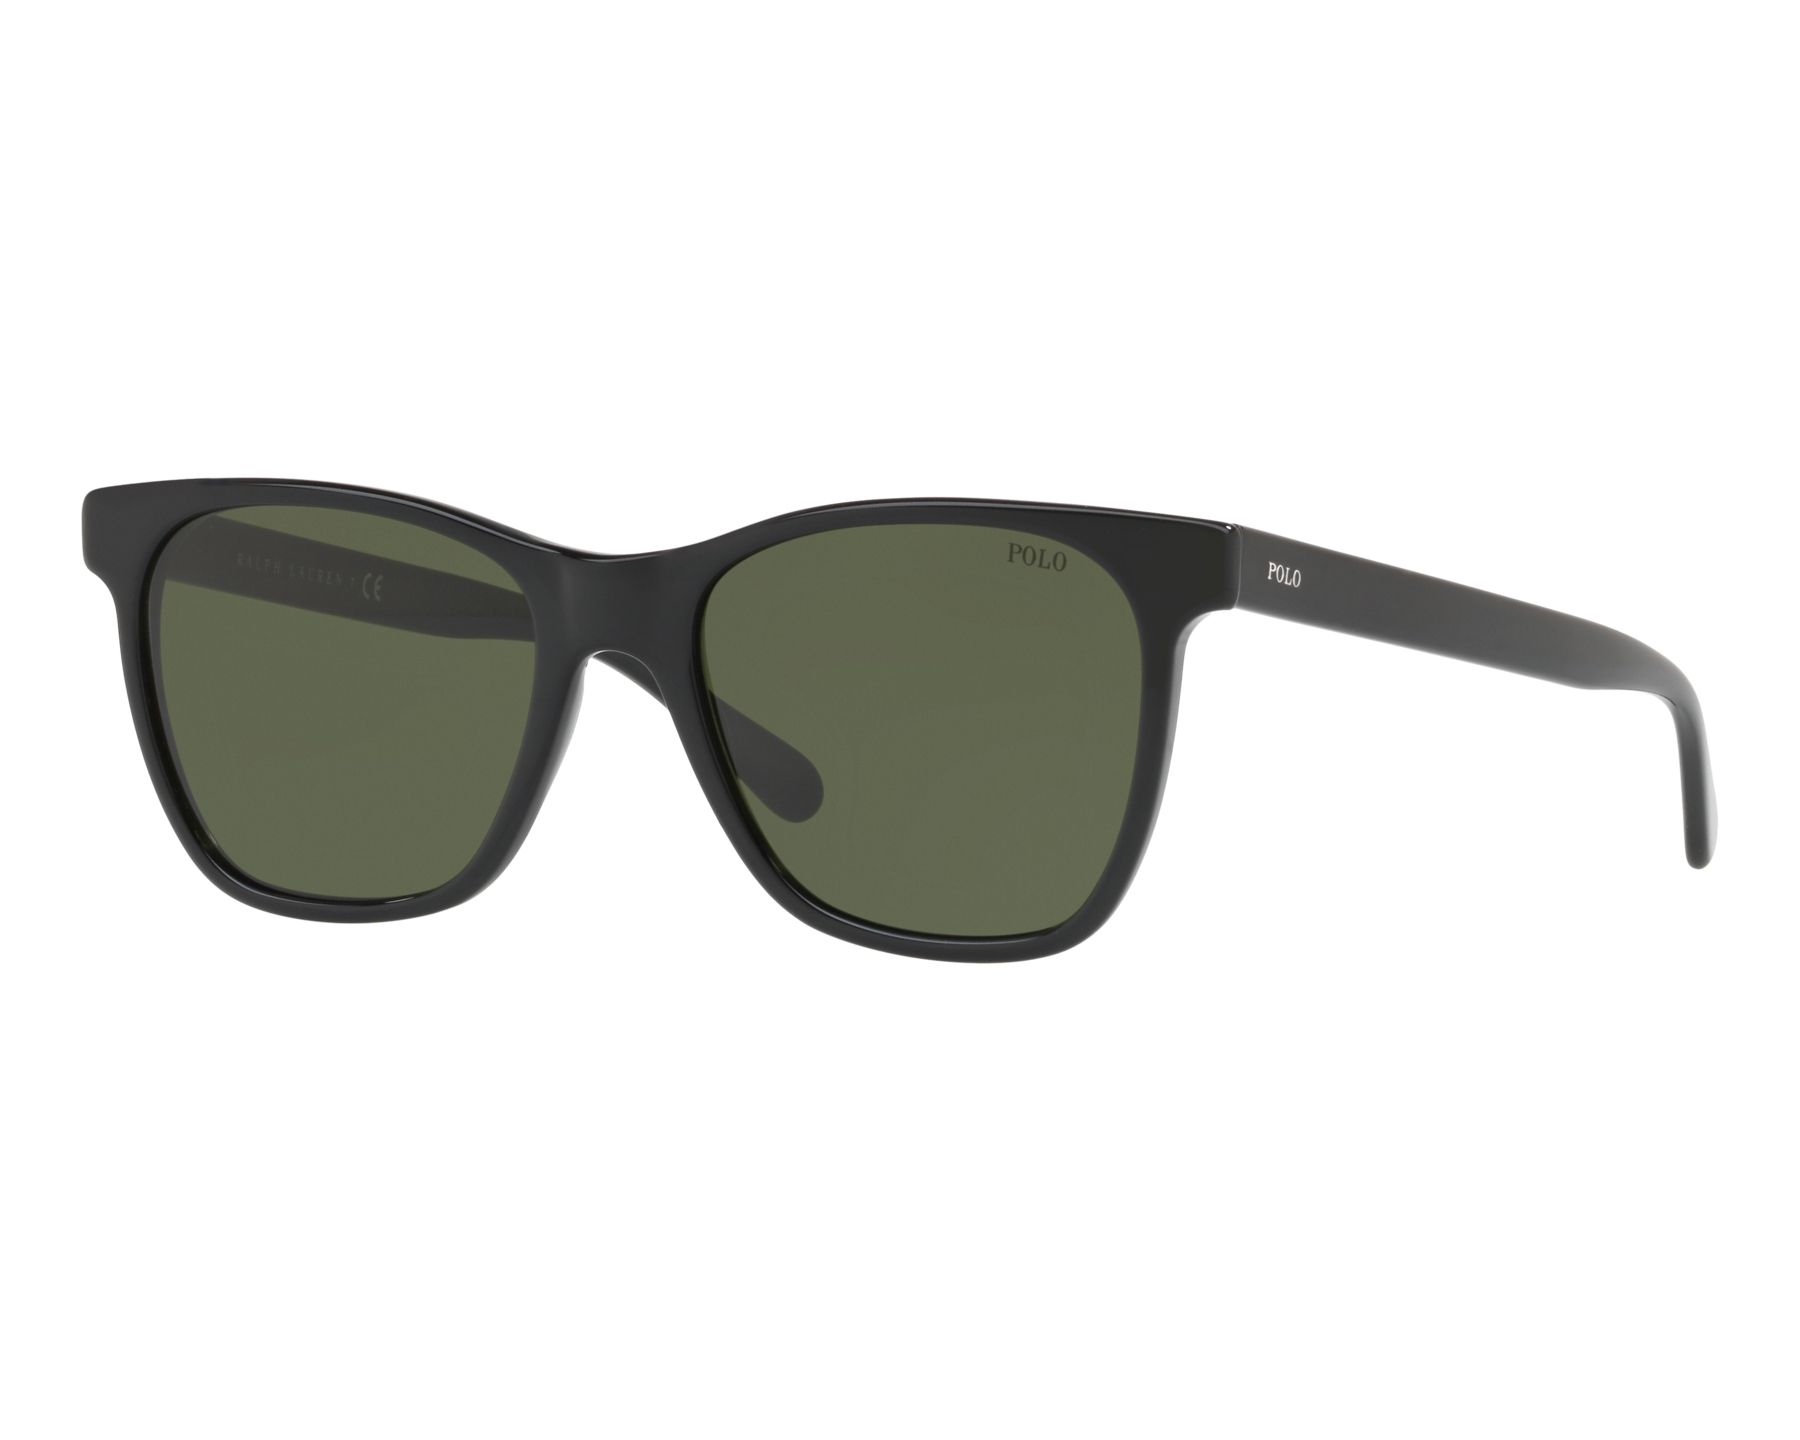 Polo Ralph Lauren 4128/500171 1ry7B